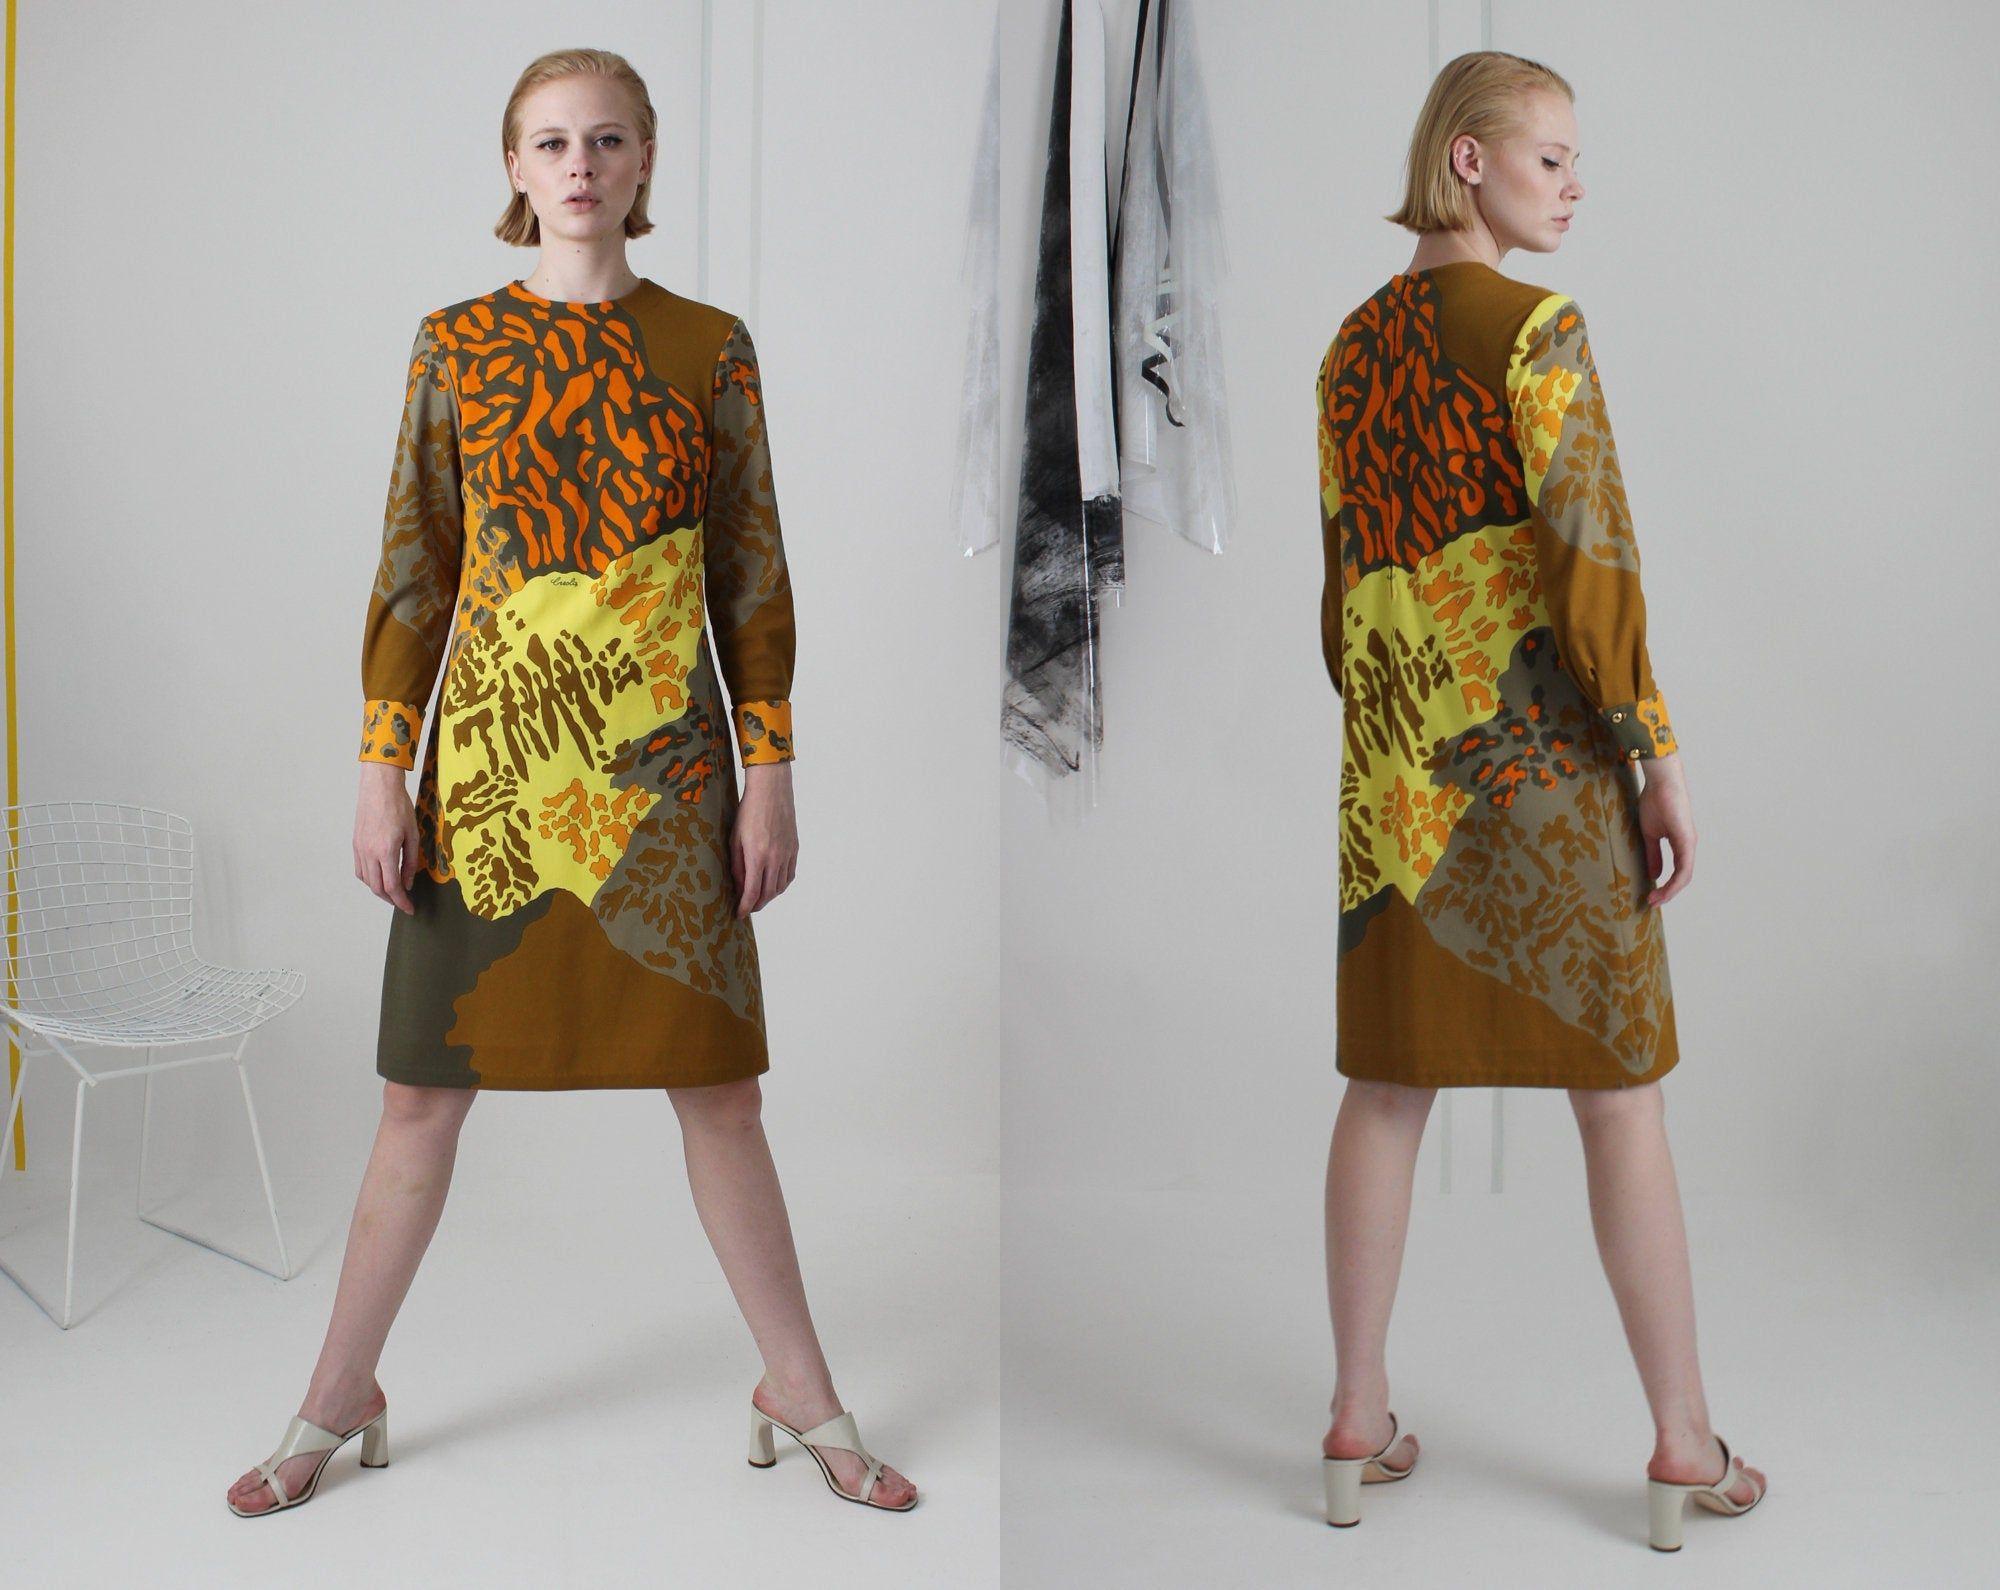 Vtg 60s 70s Psychedelic Print Shift Dress Op Art S M Etsy Printed Shift Dress Shift Dress Vintage Outfits [ 1590 x 2000 Pixel ]